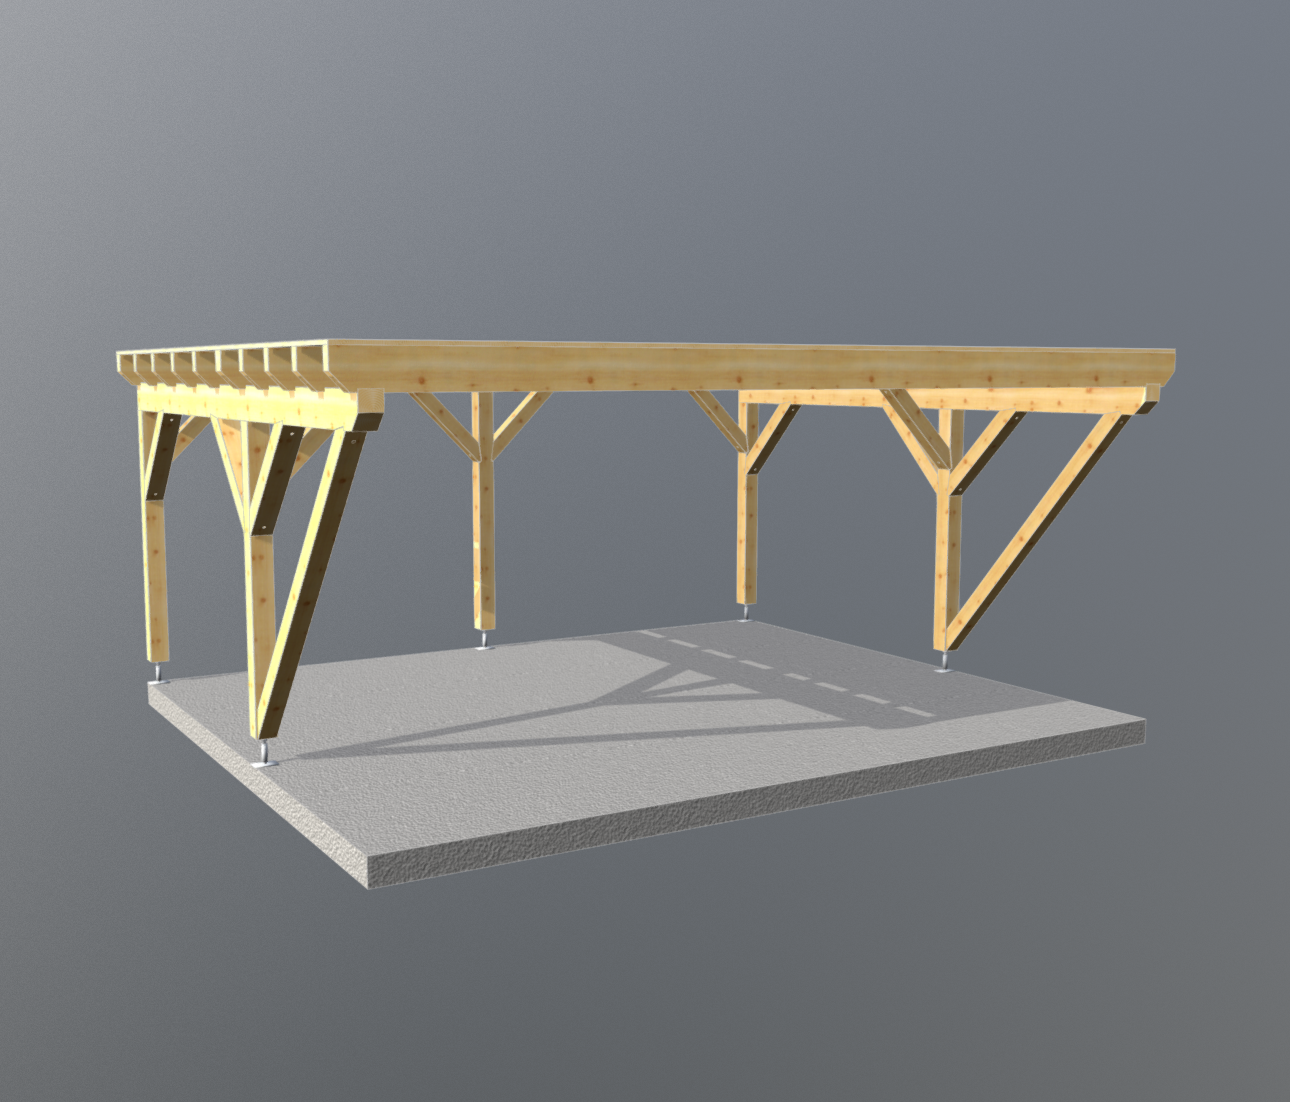 Holz carport 6m x 5m flachdach, carports aus polen